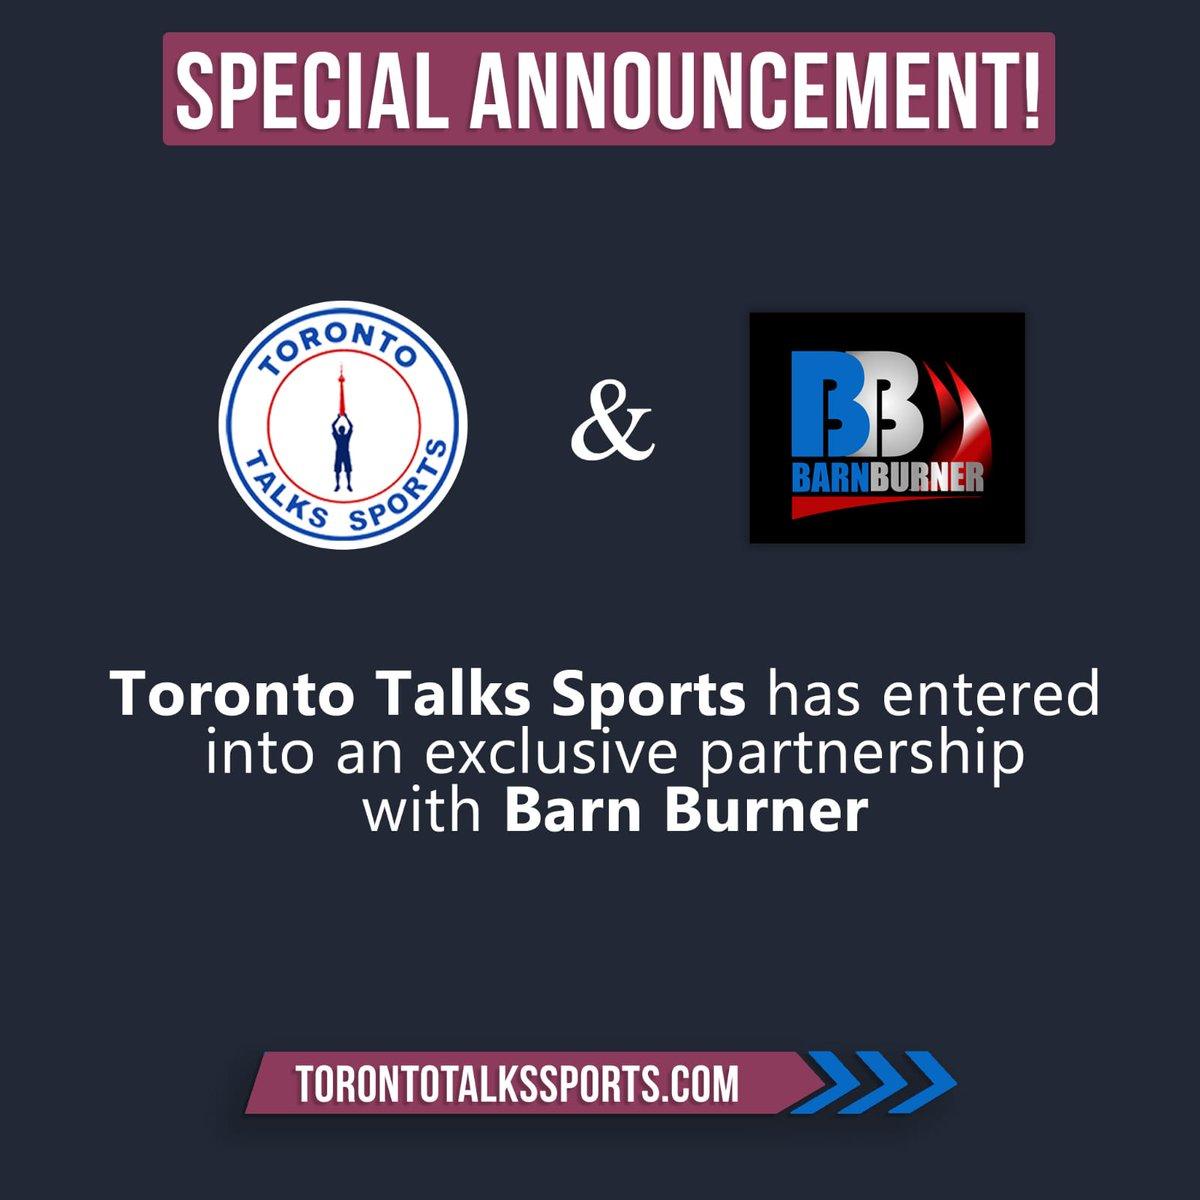 Apple Itunes Iphone Users Https Itunes Apple Com Ca Podcast Toronto Talks Sports More Id1358706156mt2 Www Torontotalkssports Com